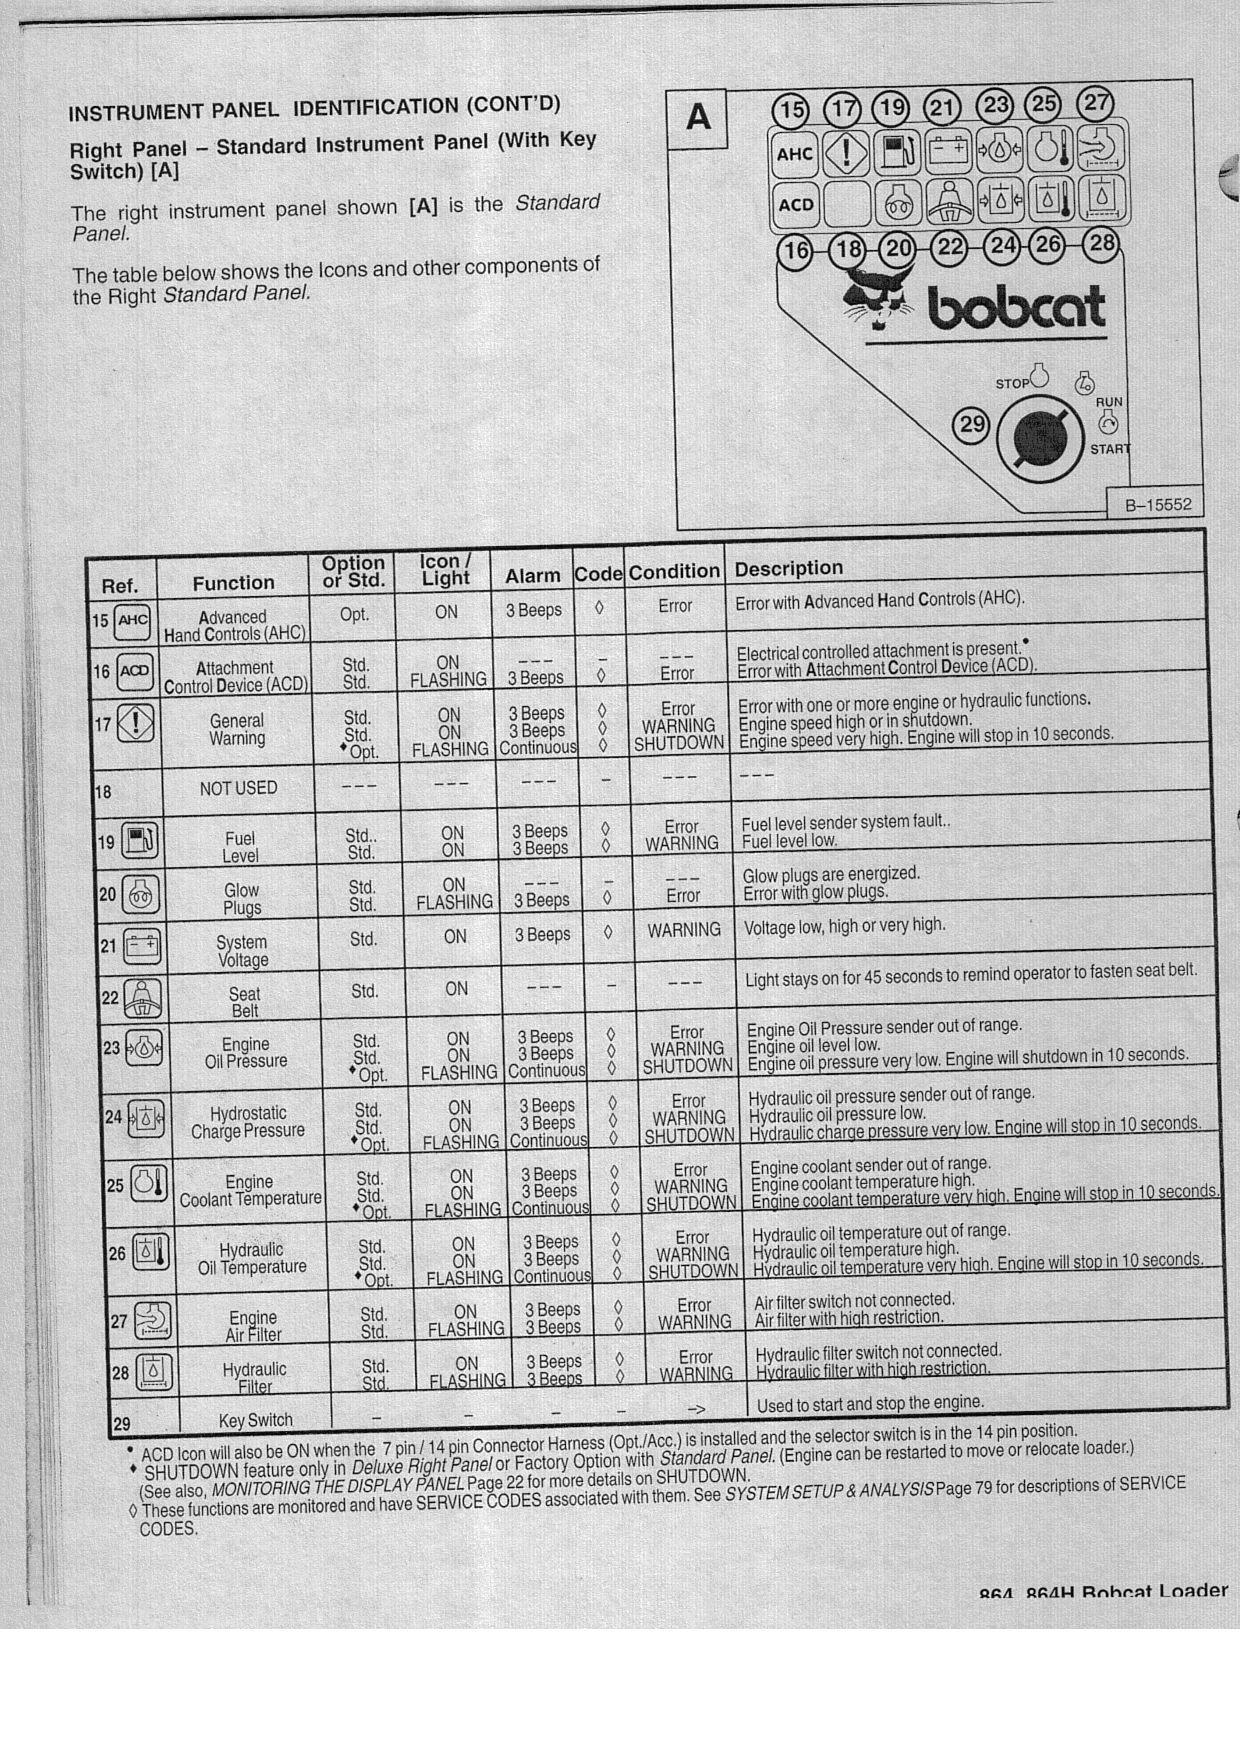 Bobcat 853H